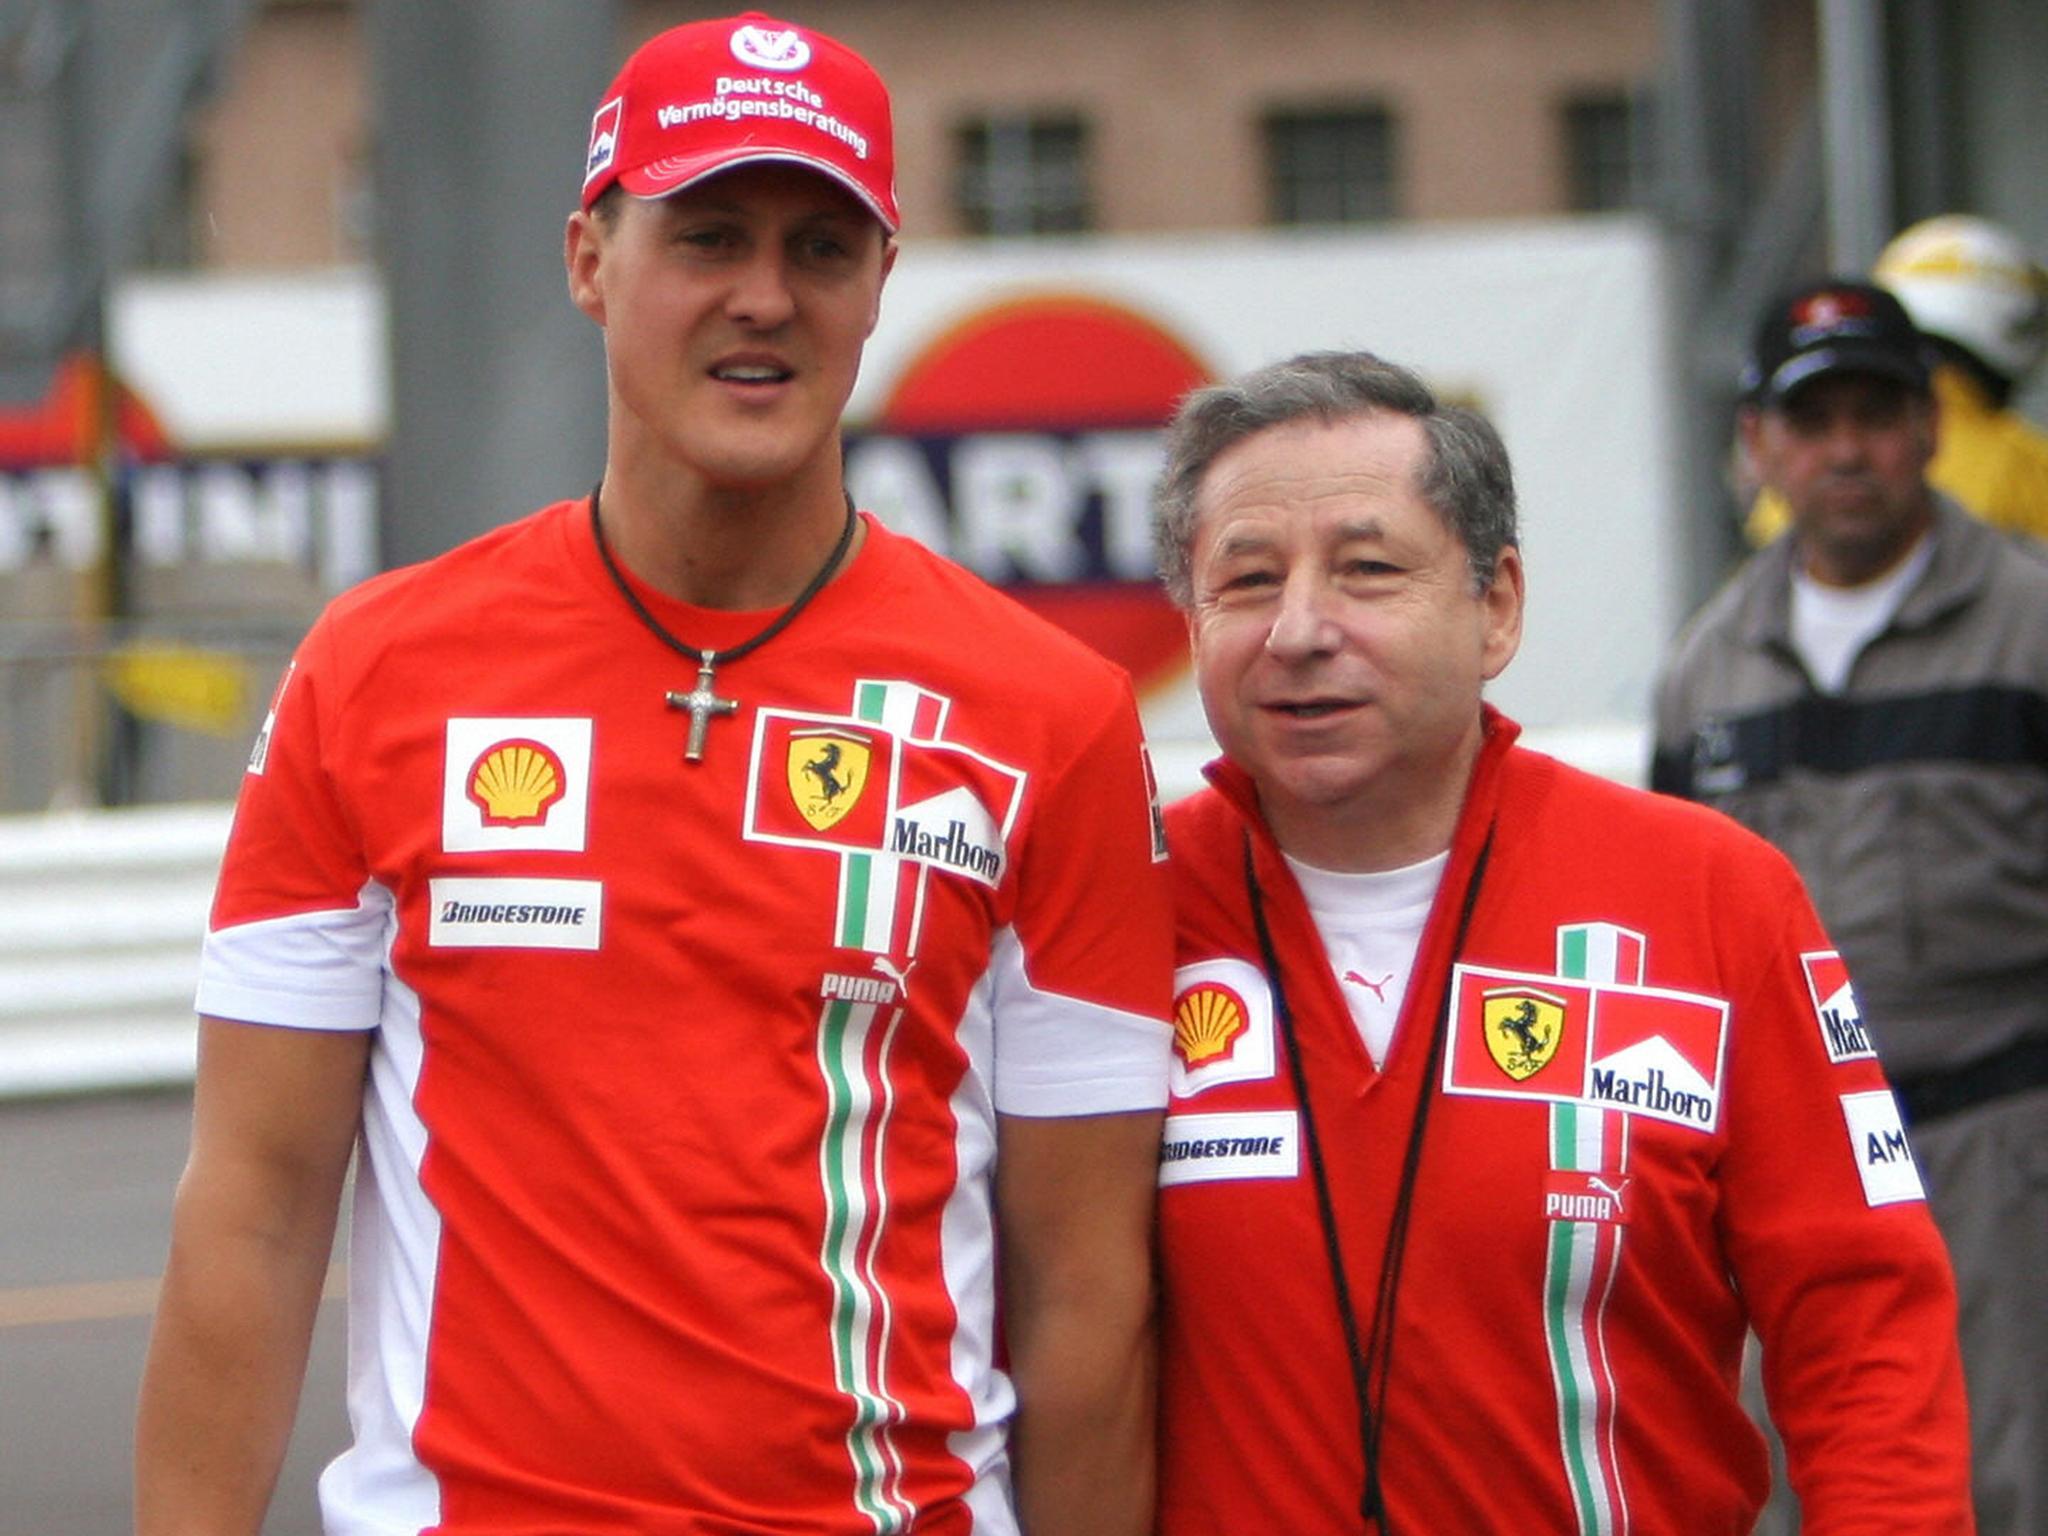 Rip Michael Schumacher